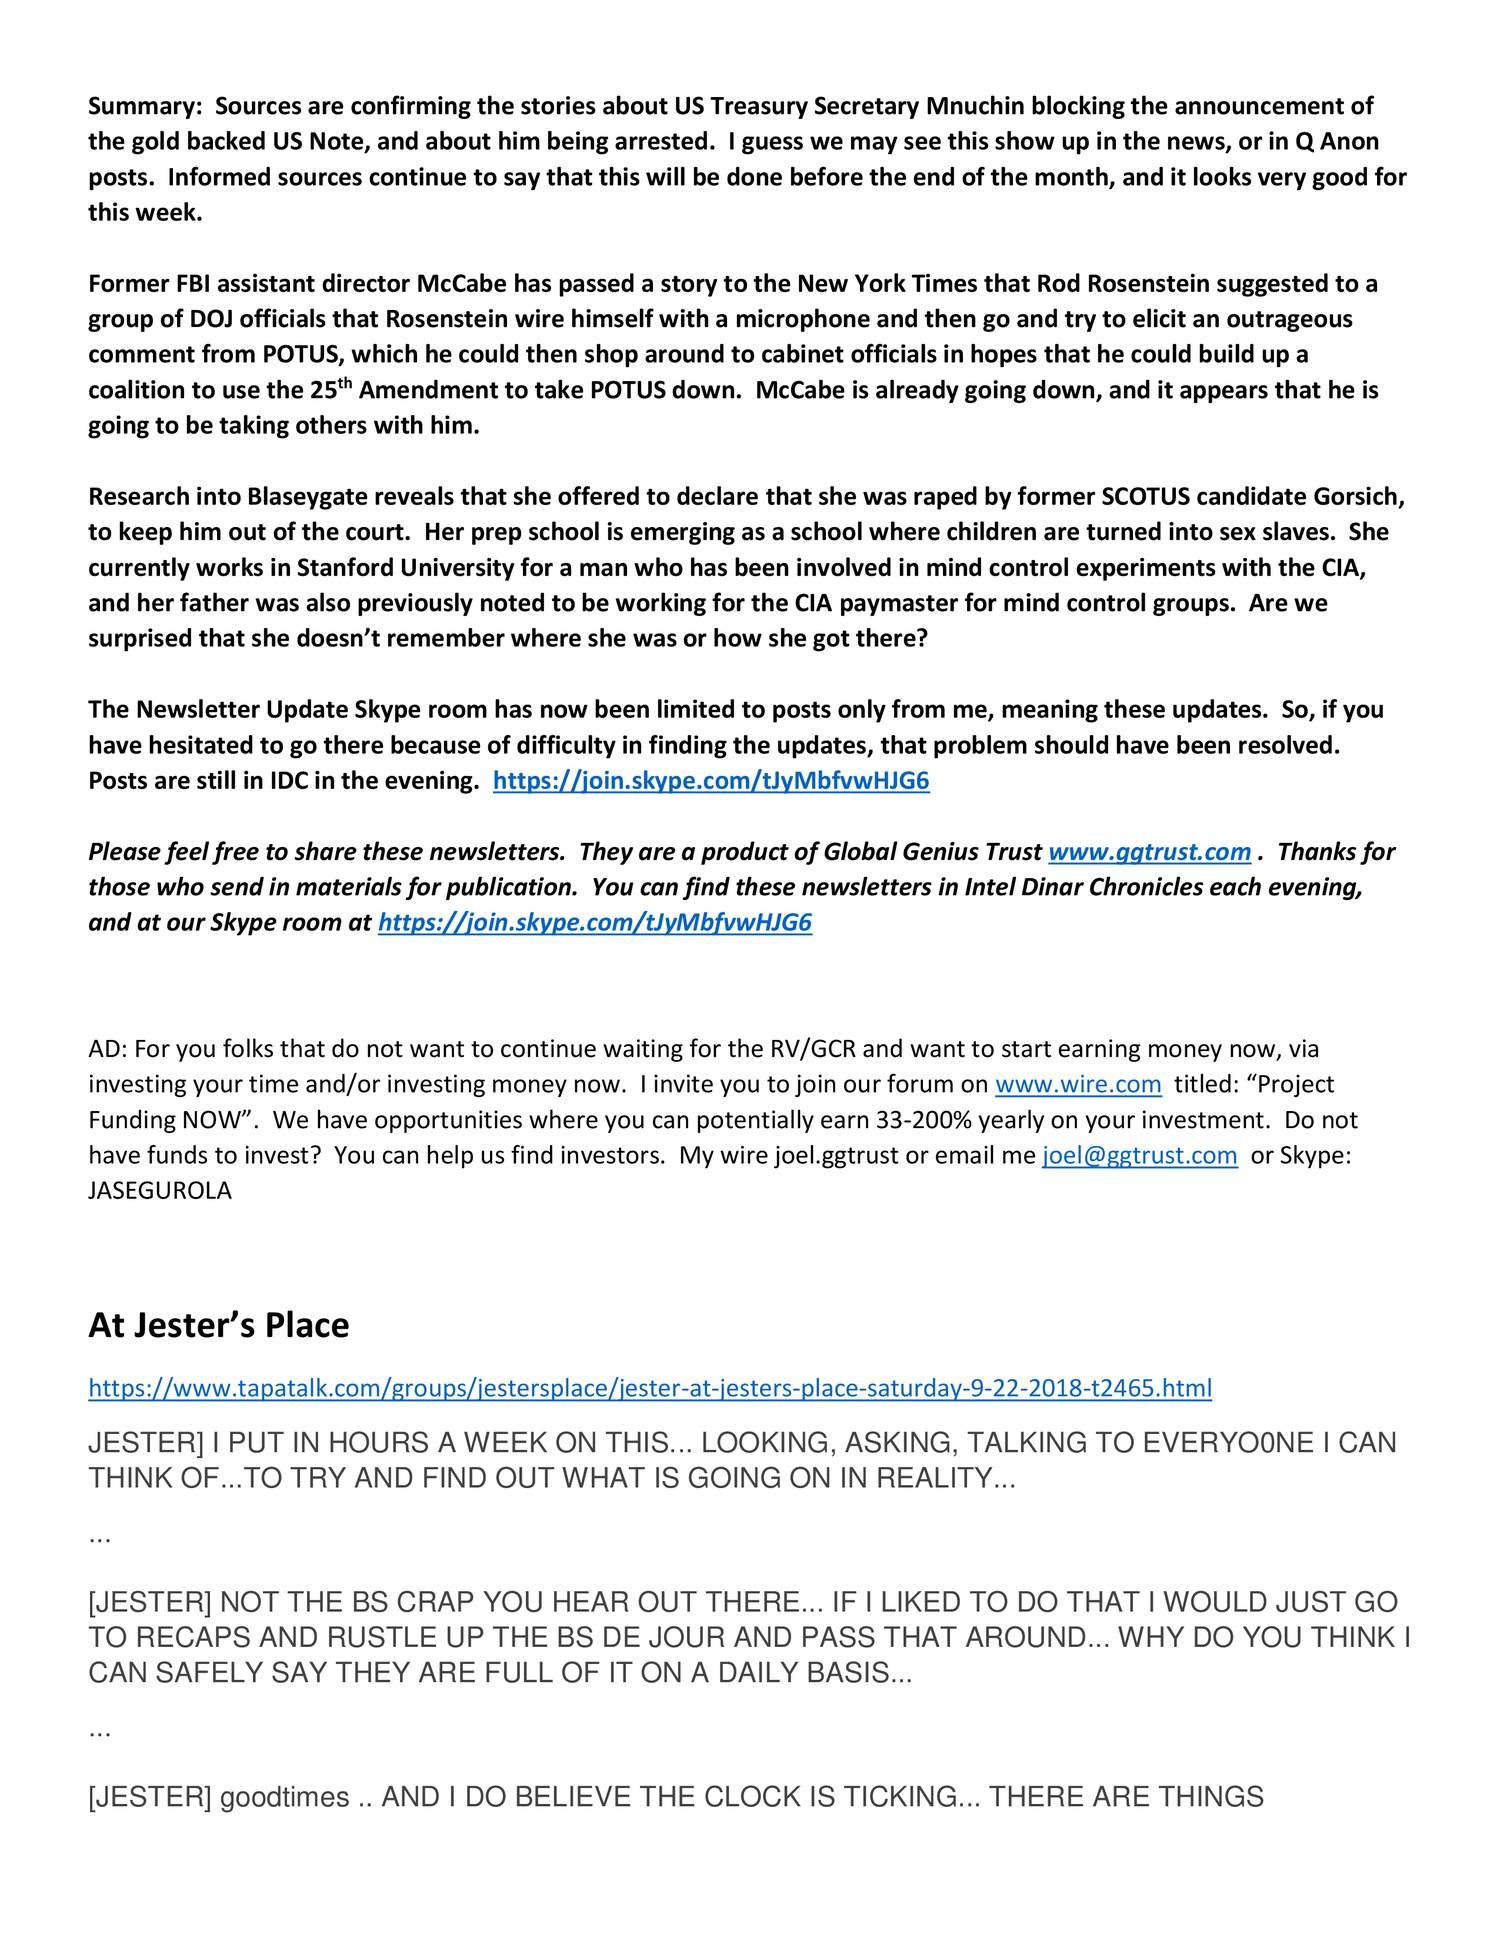 Sunday PM 23 Sep 2018 pdf | DocDroid